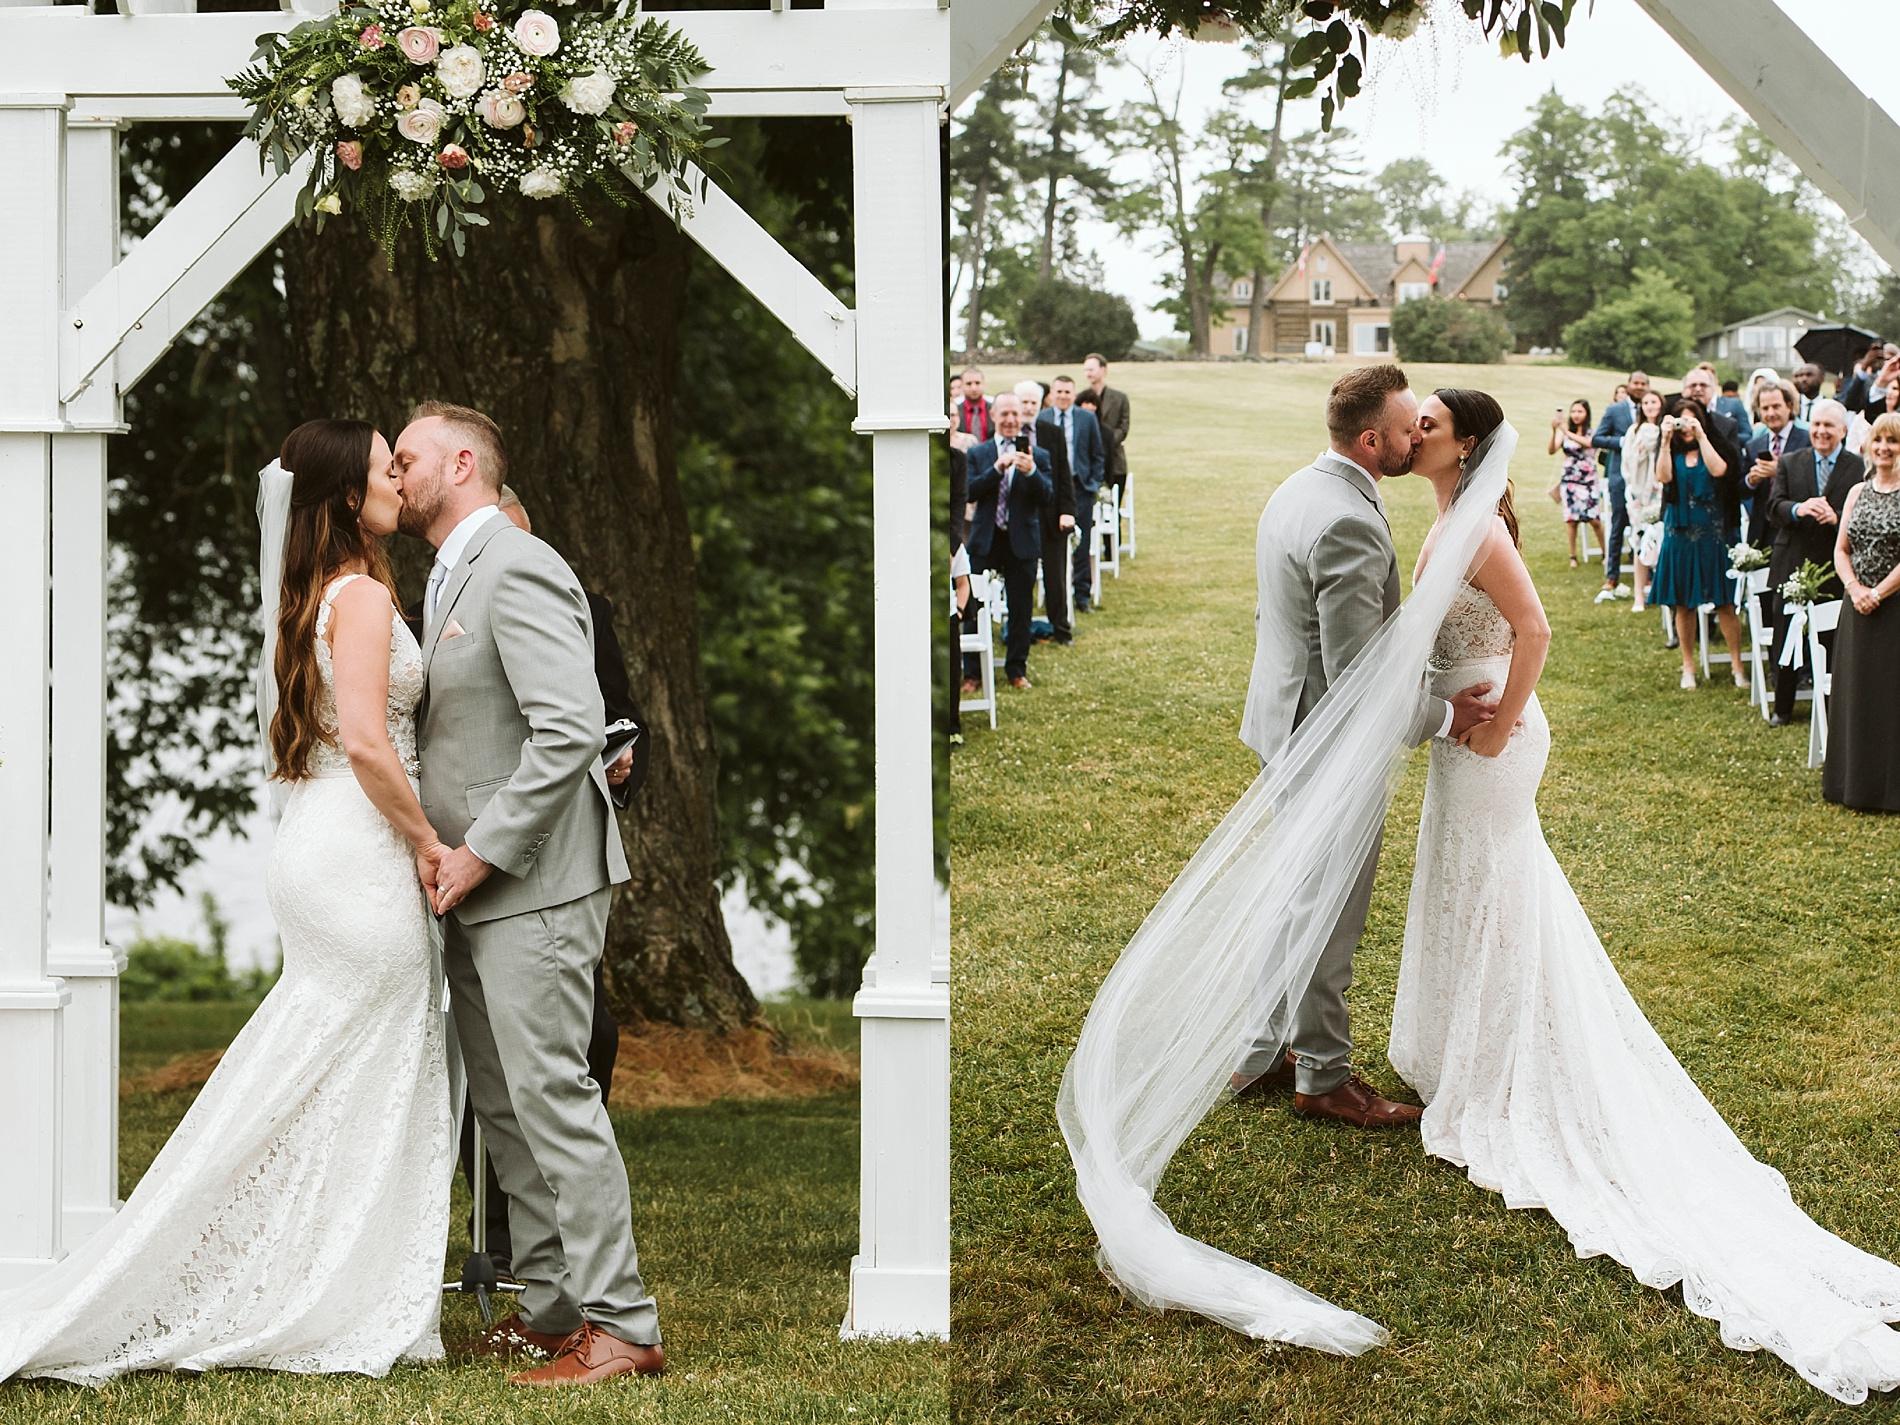 Kawartha_Lakes_Wedding_Bobcageon_Eganridge_Resort_Toronto_Photographer_0039.jpg